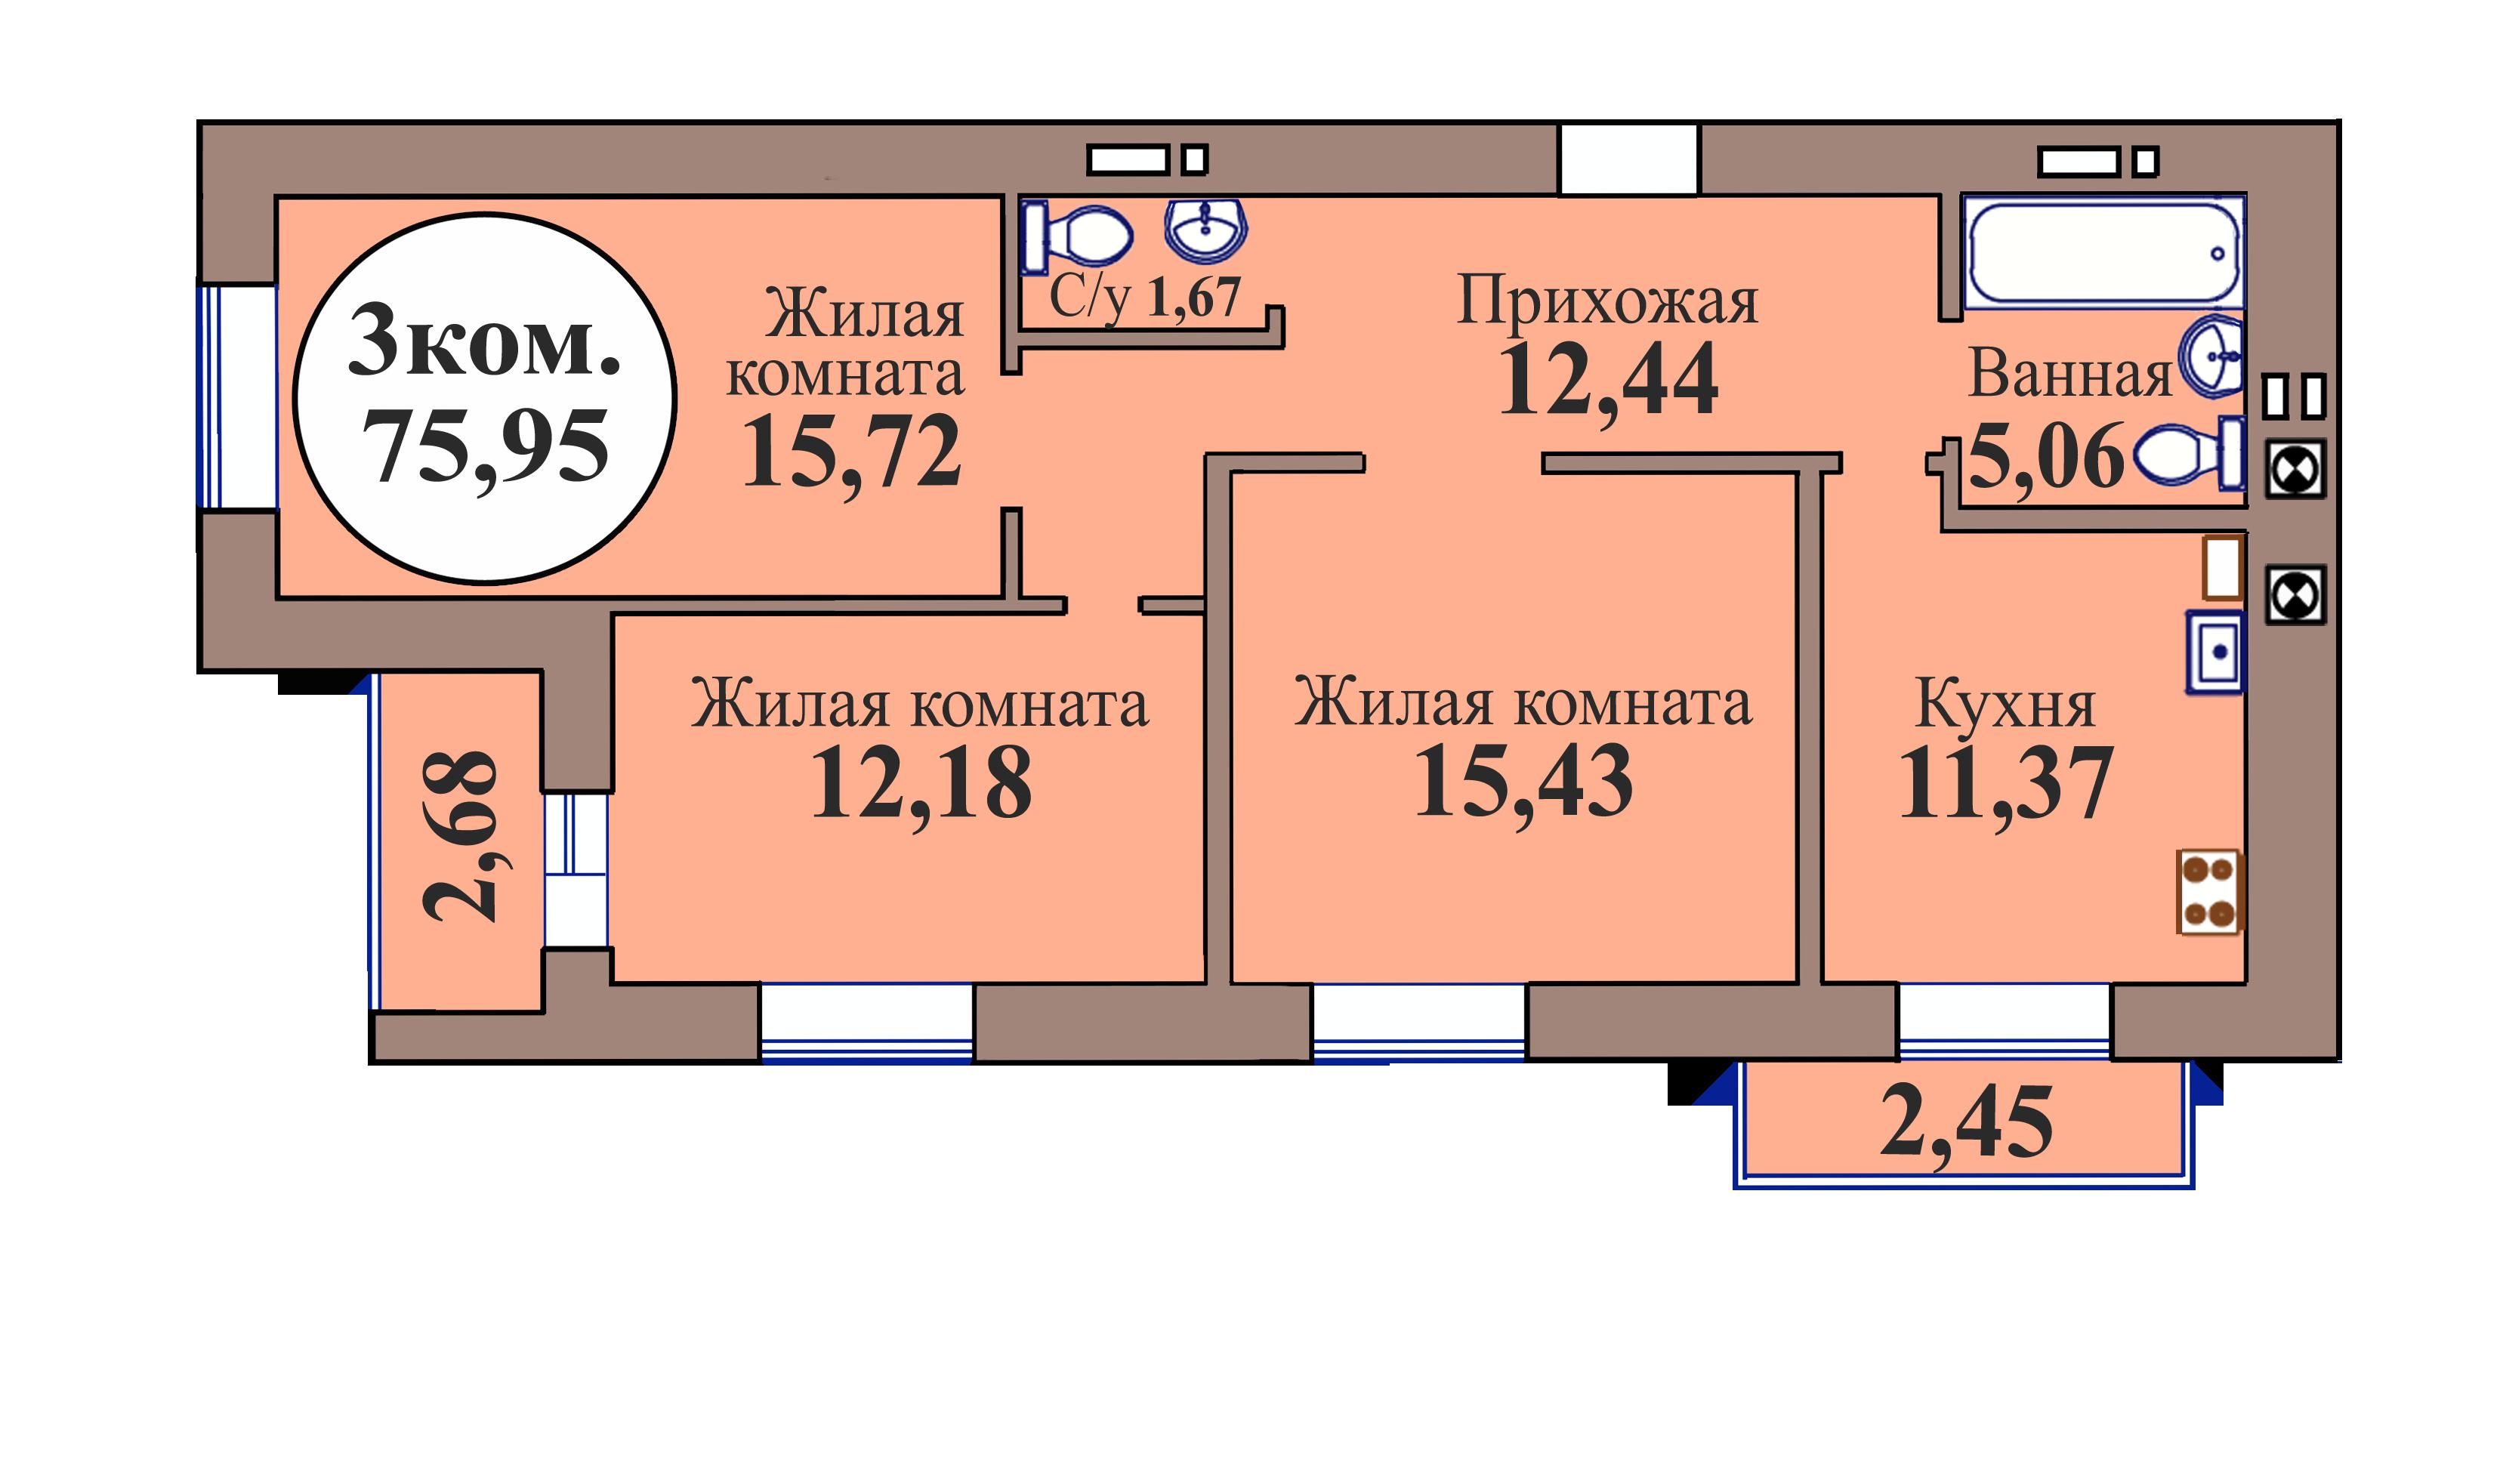 3-комн. кв. по ГП дом №3, МКР Васильково, кв. 212 в Калининграде